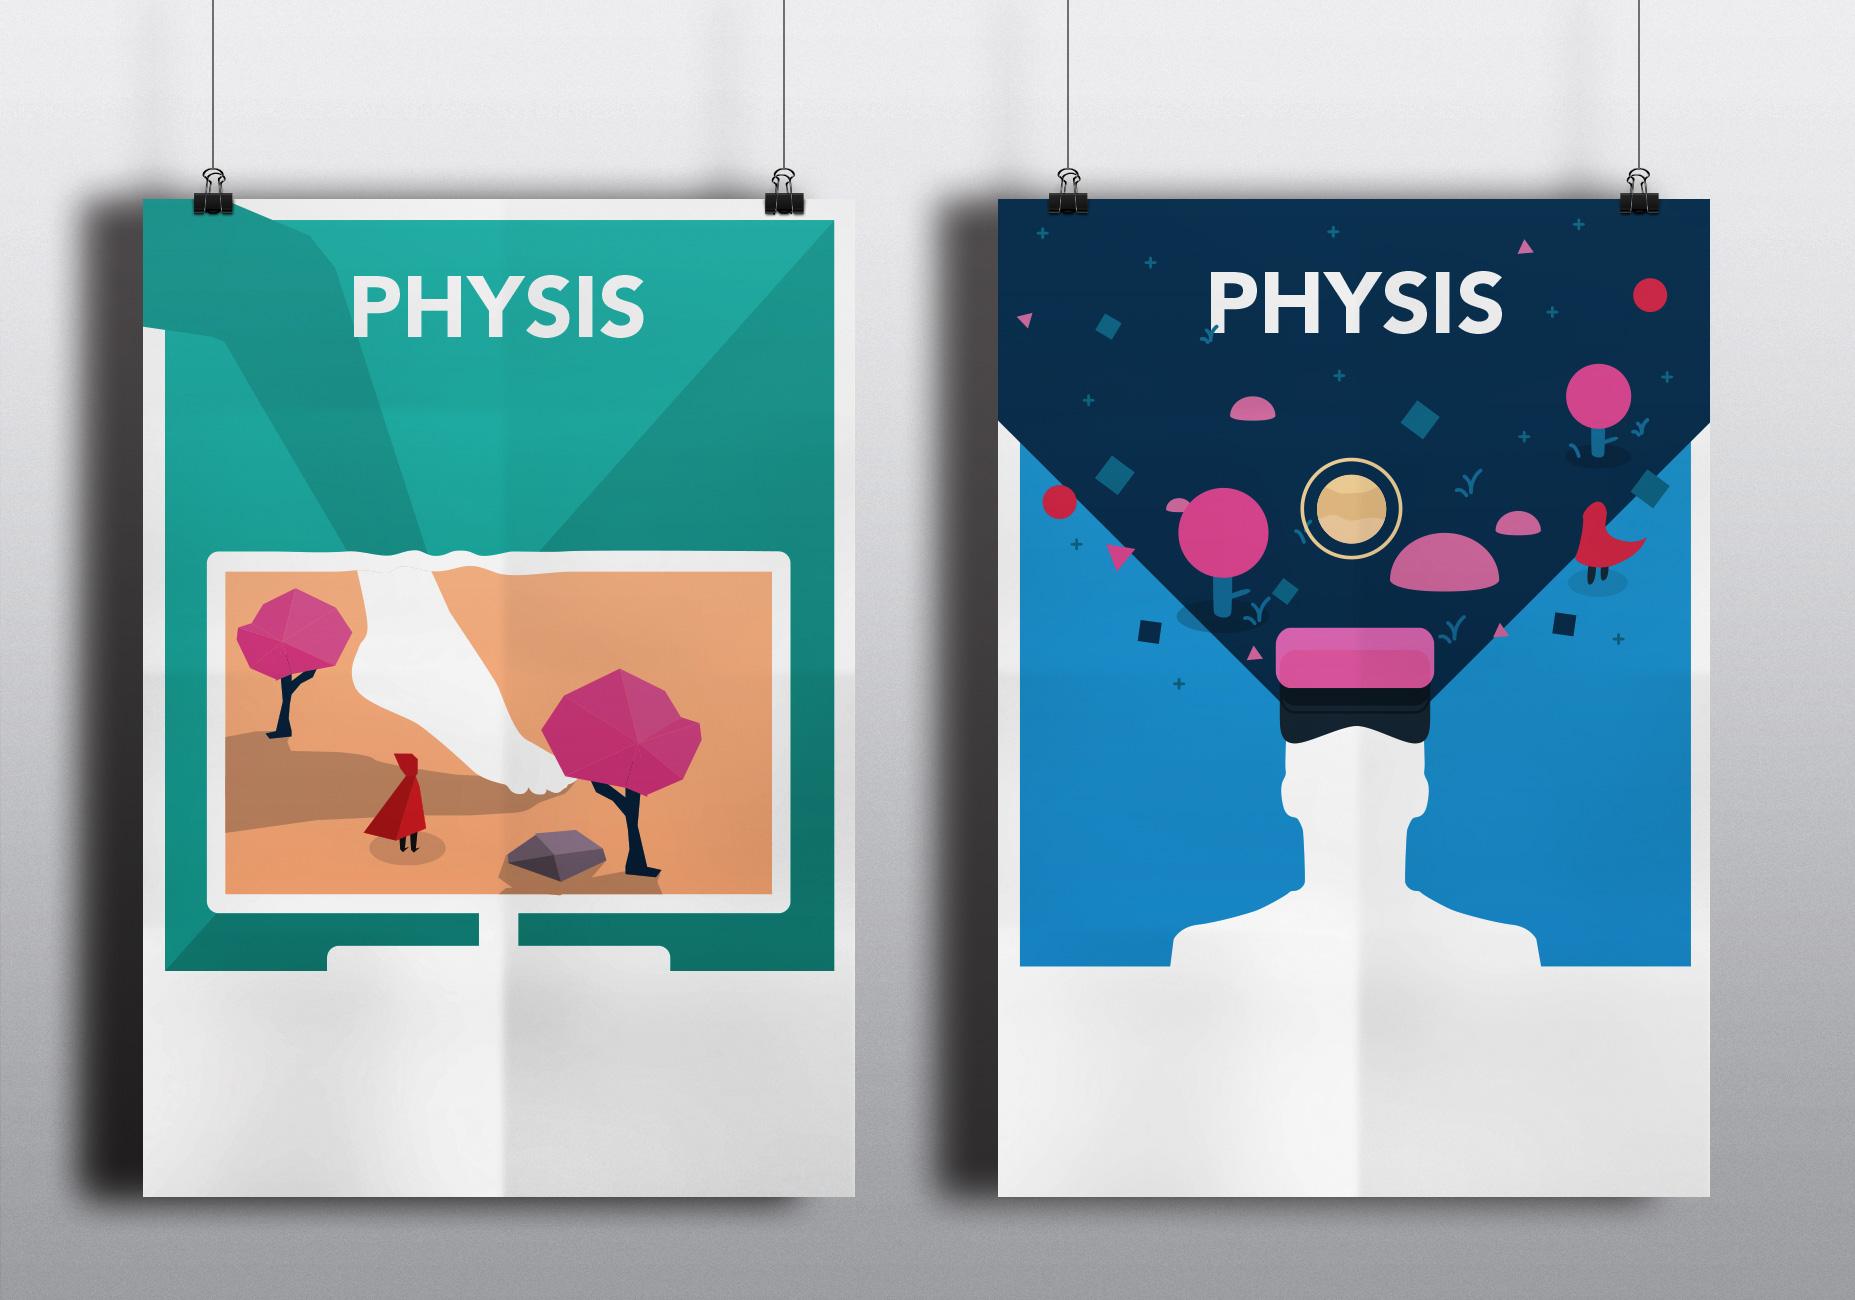 shelly-alon-game-design-Physis